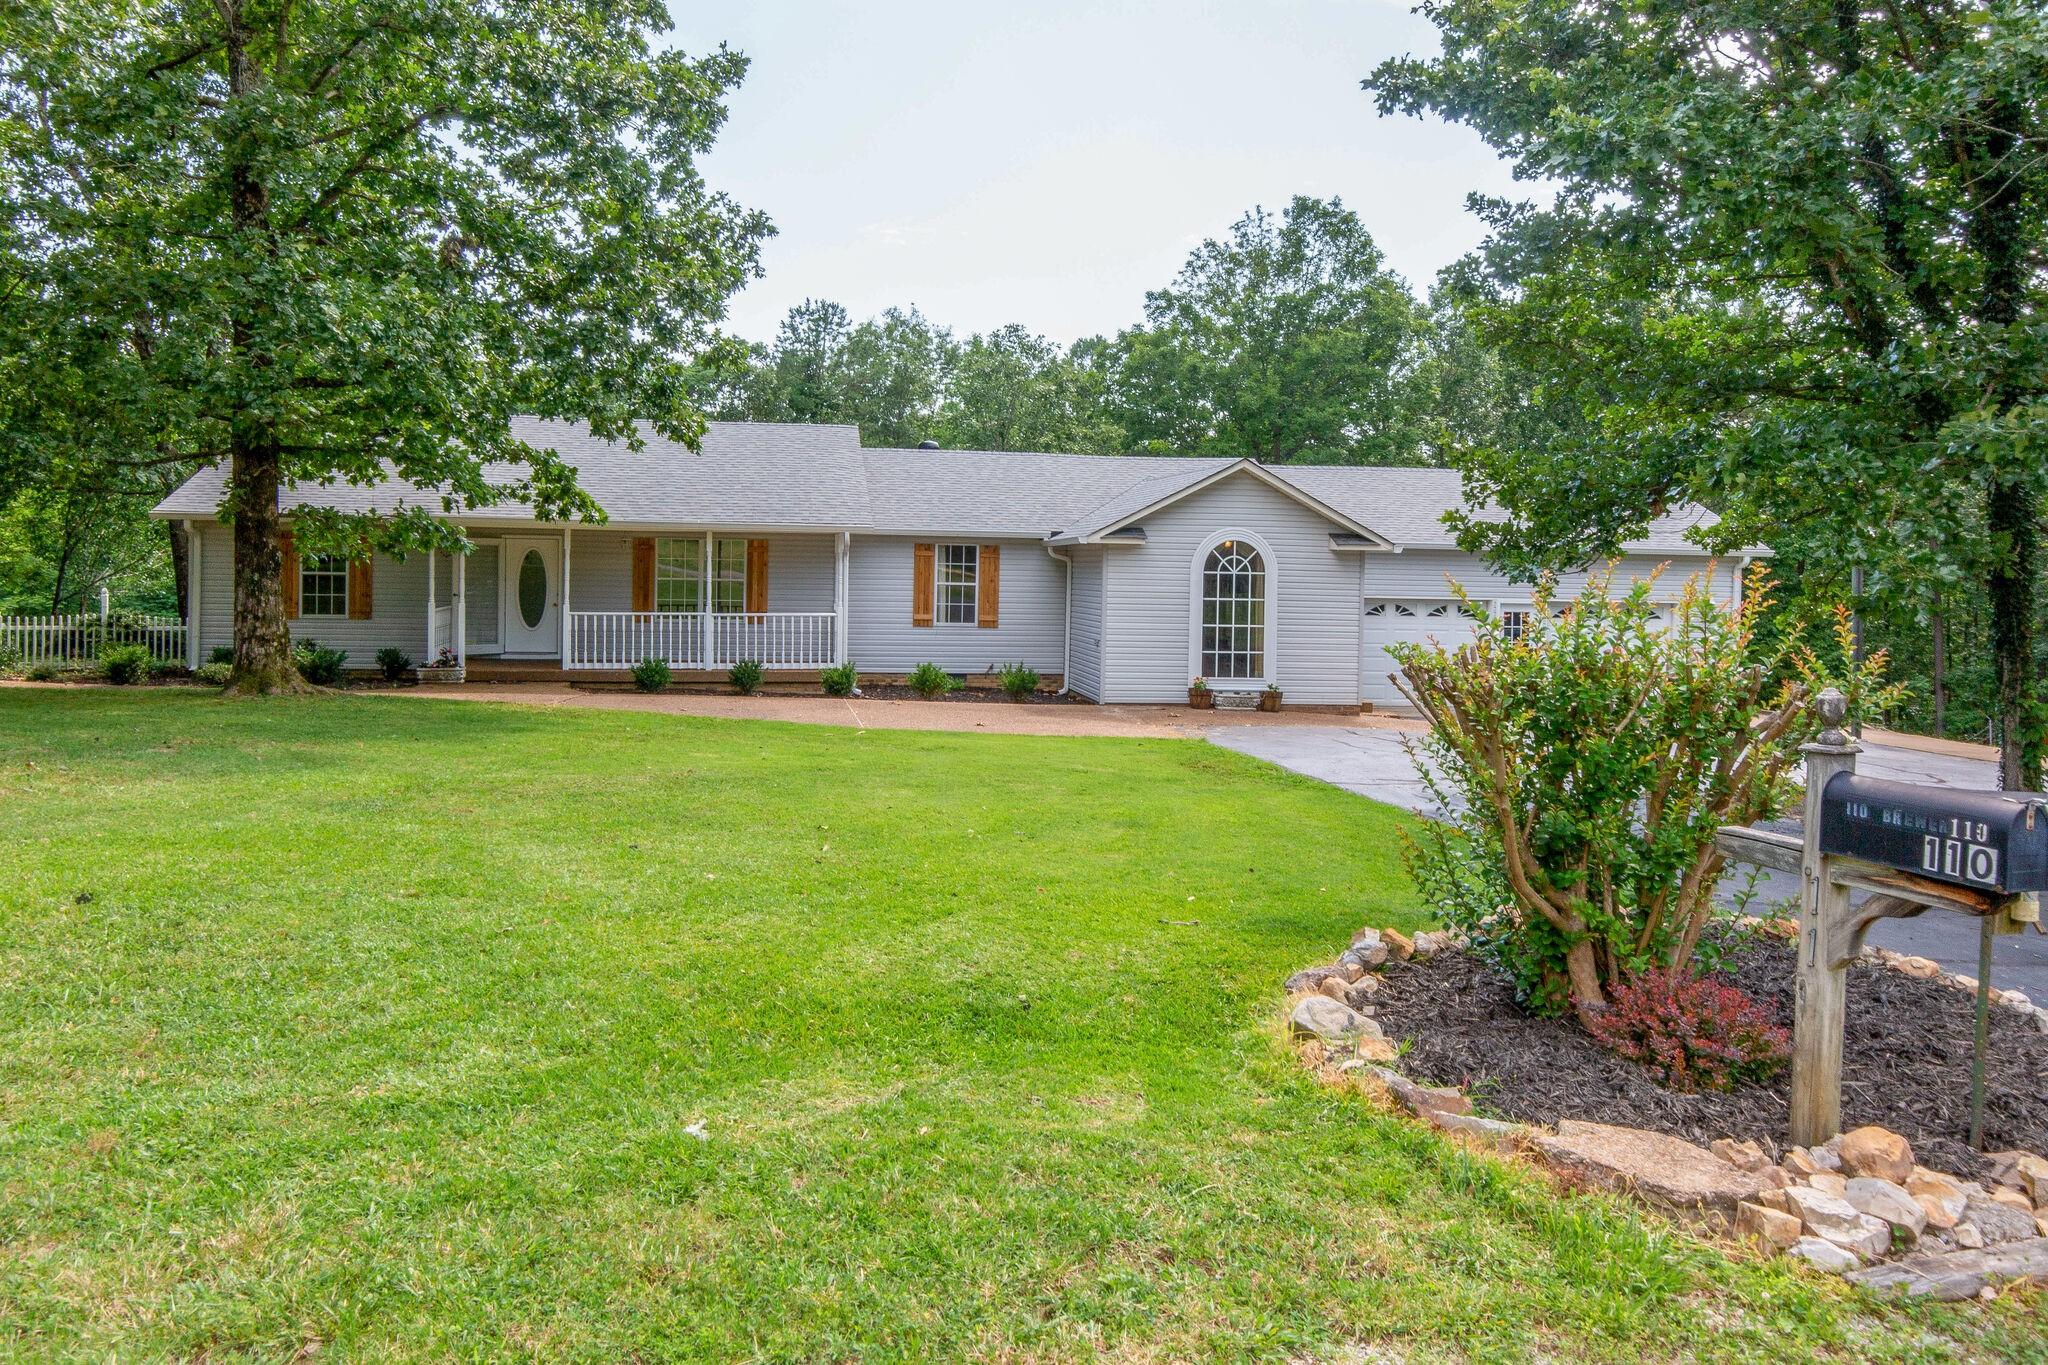 110 Madison St Property Photo - Hohenwald, TN real estate listing